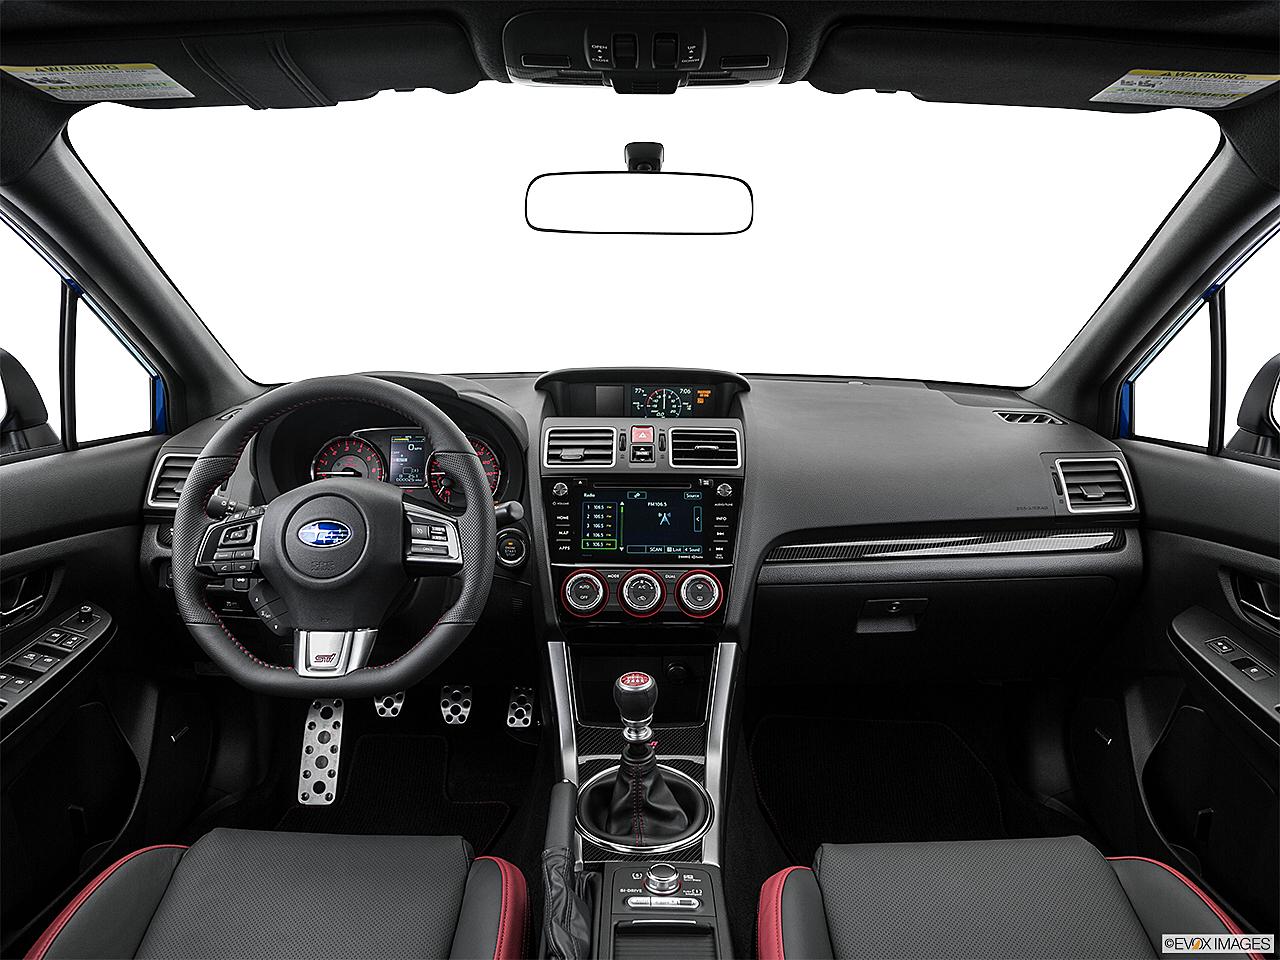 2016 subaru wrx awd sti limited 4dr sedan w low profile spoiler research groovecar. Black Bedroom Furniture Sets. Home Design Ideas